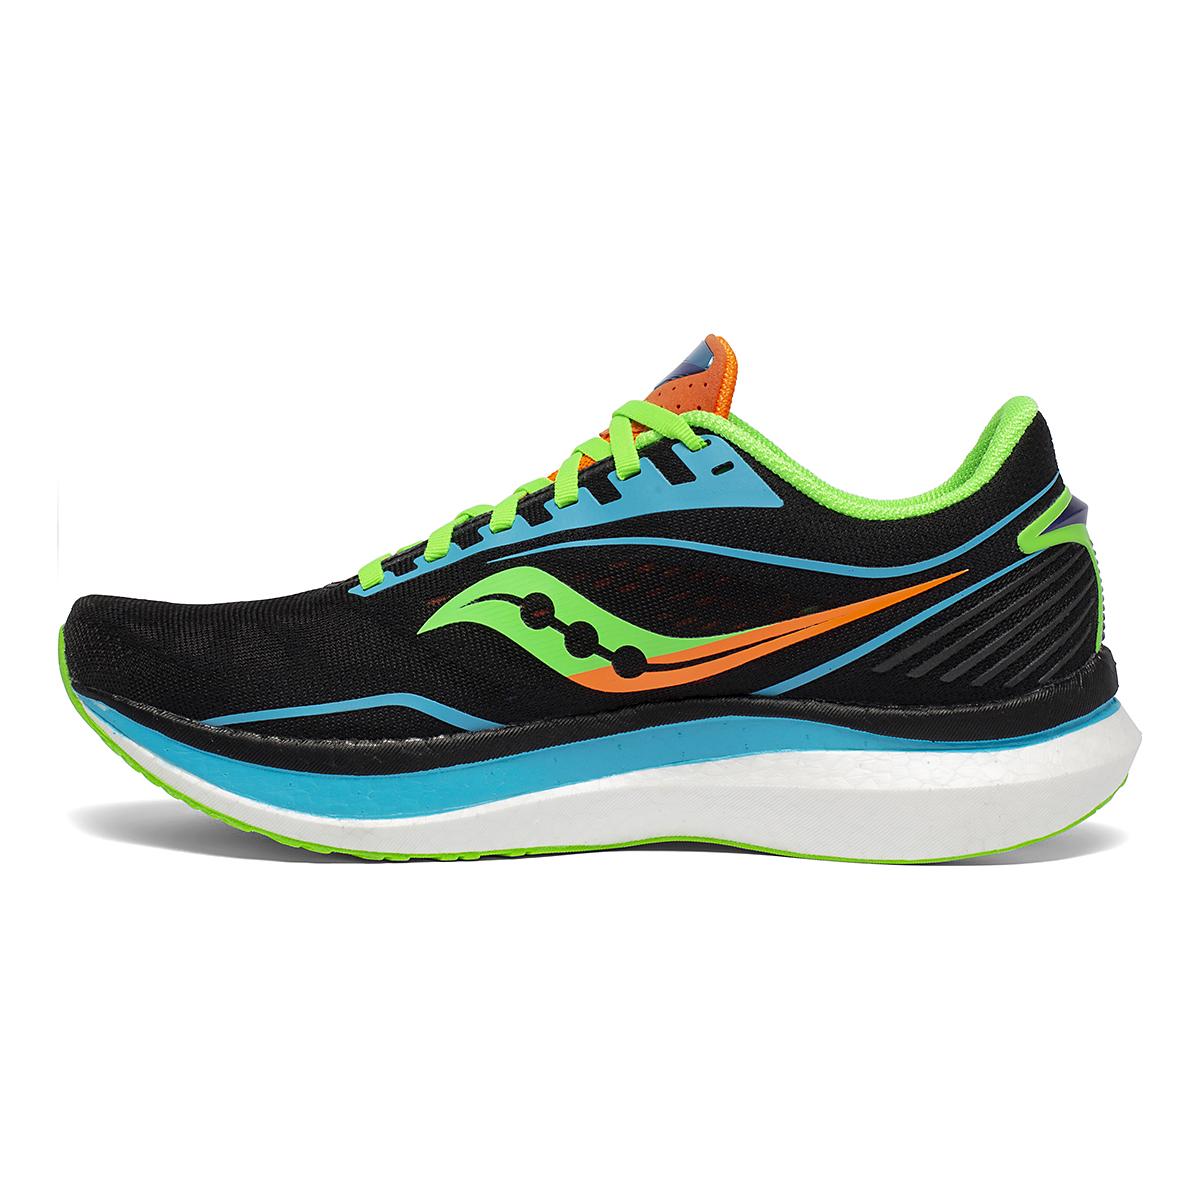 Men's Saucony Endorphin Speed Running Shoe - Color: Future/Black - Size: 7.5 - Width: Regular, Future/Black, large, image 2